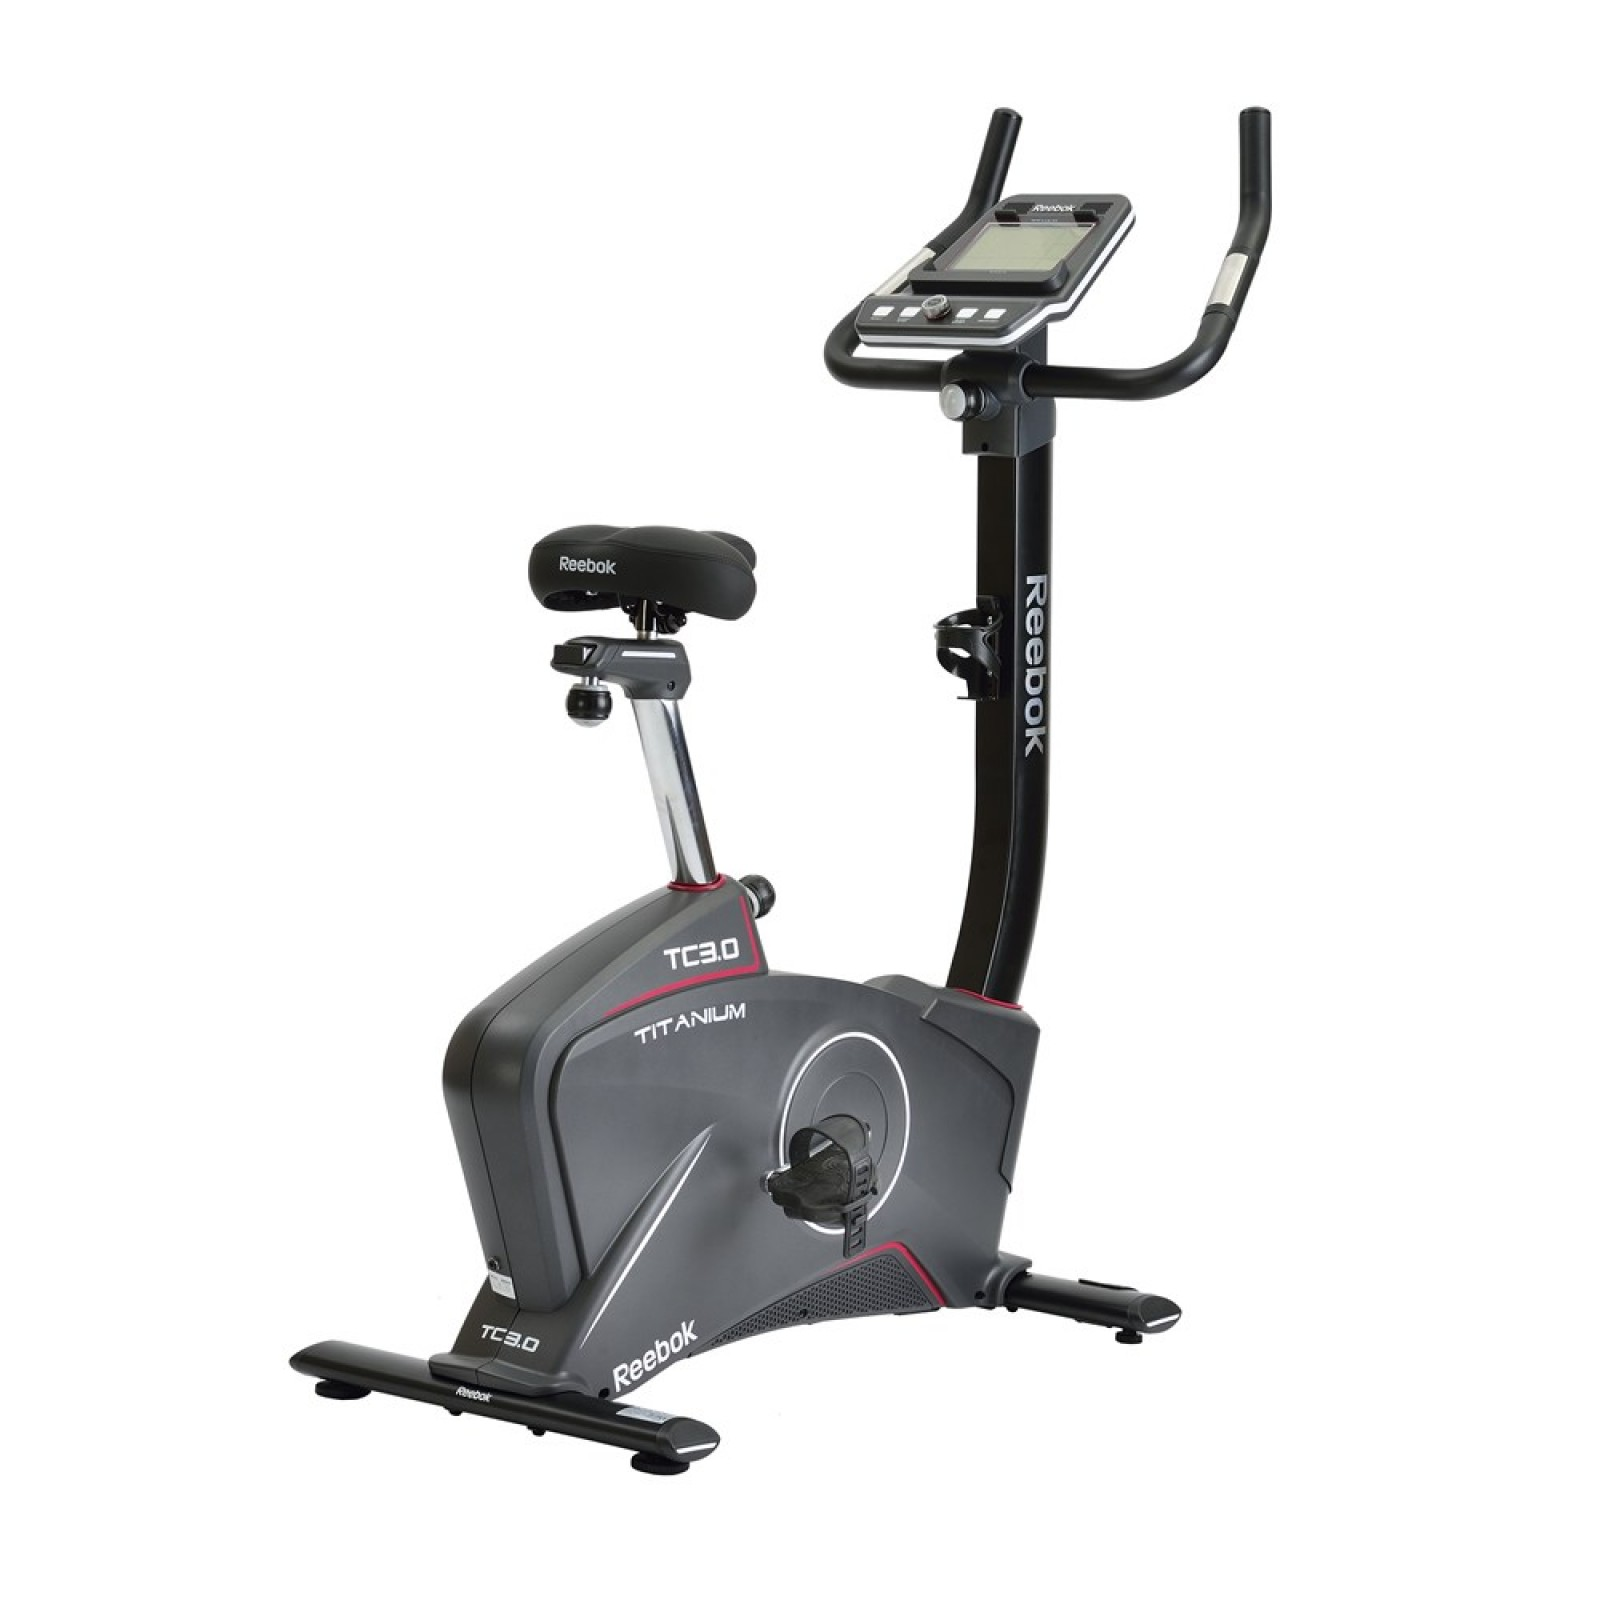 reebok exercise machine